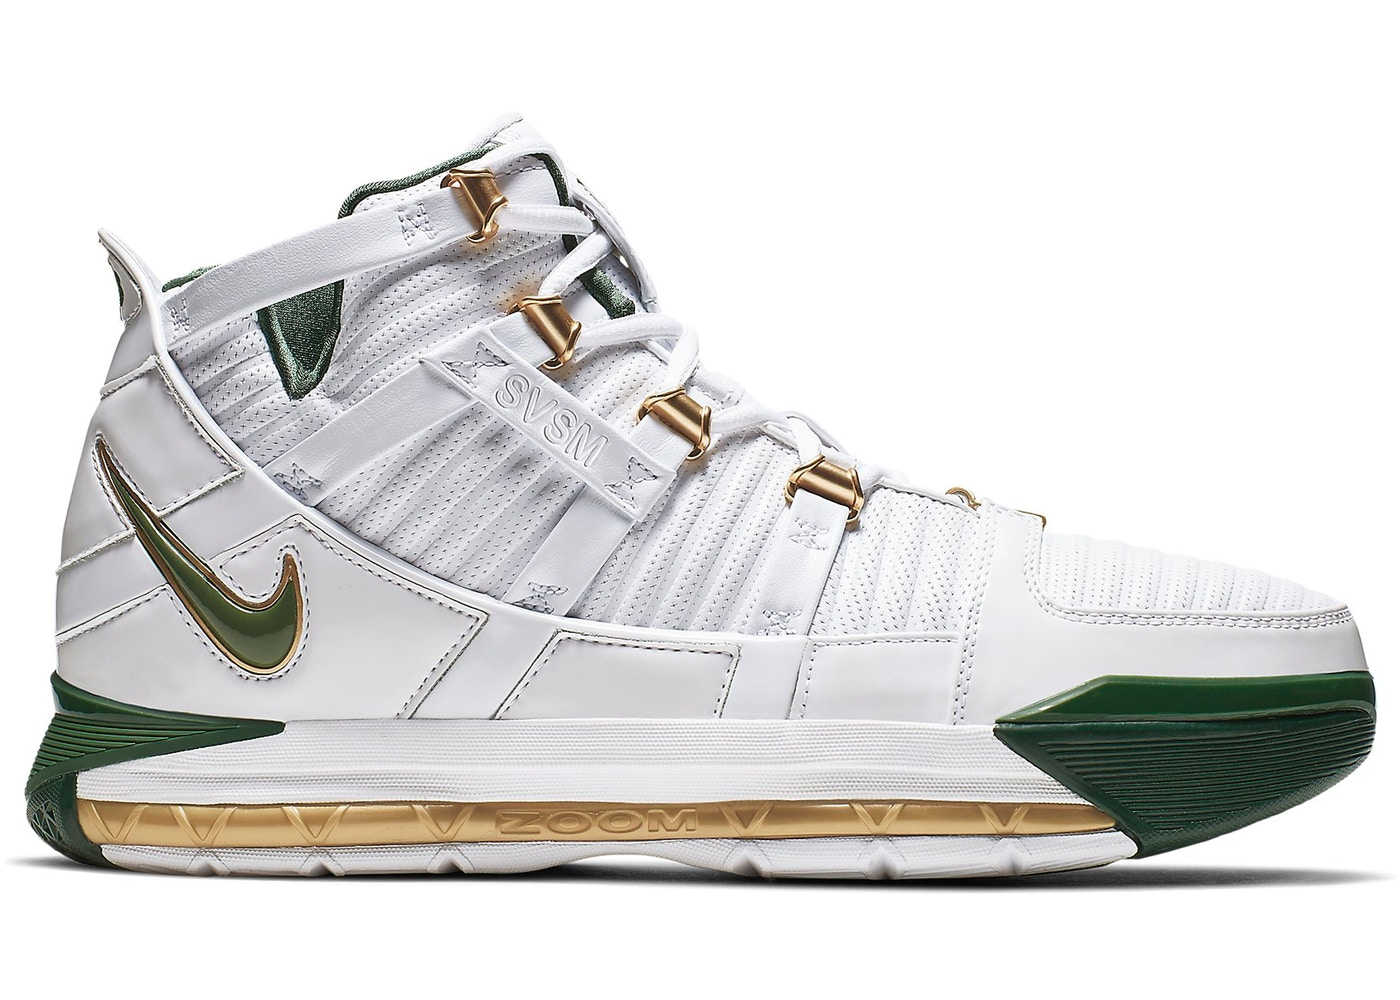 aea65b8fd360b Buy Nike LeBron 3 Shoes   Deadstock Sneakers